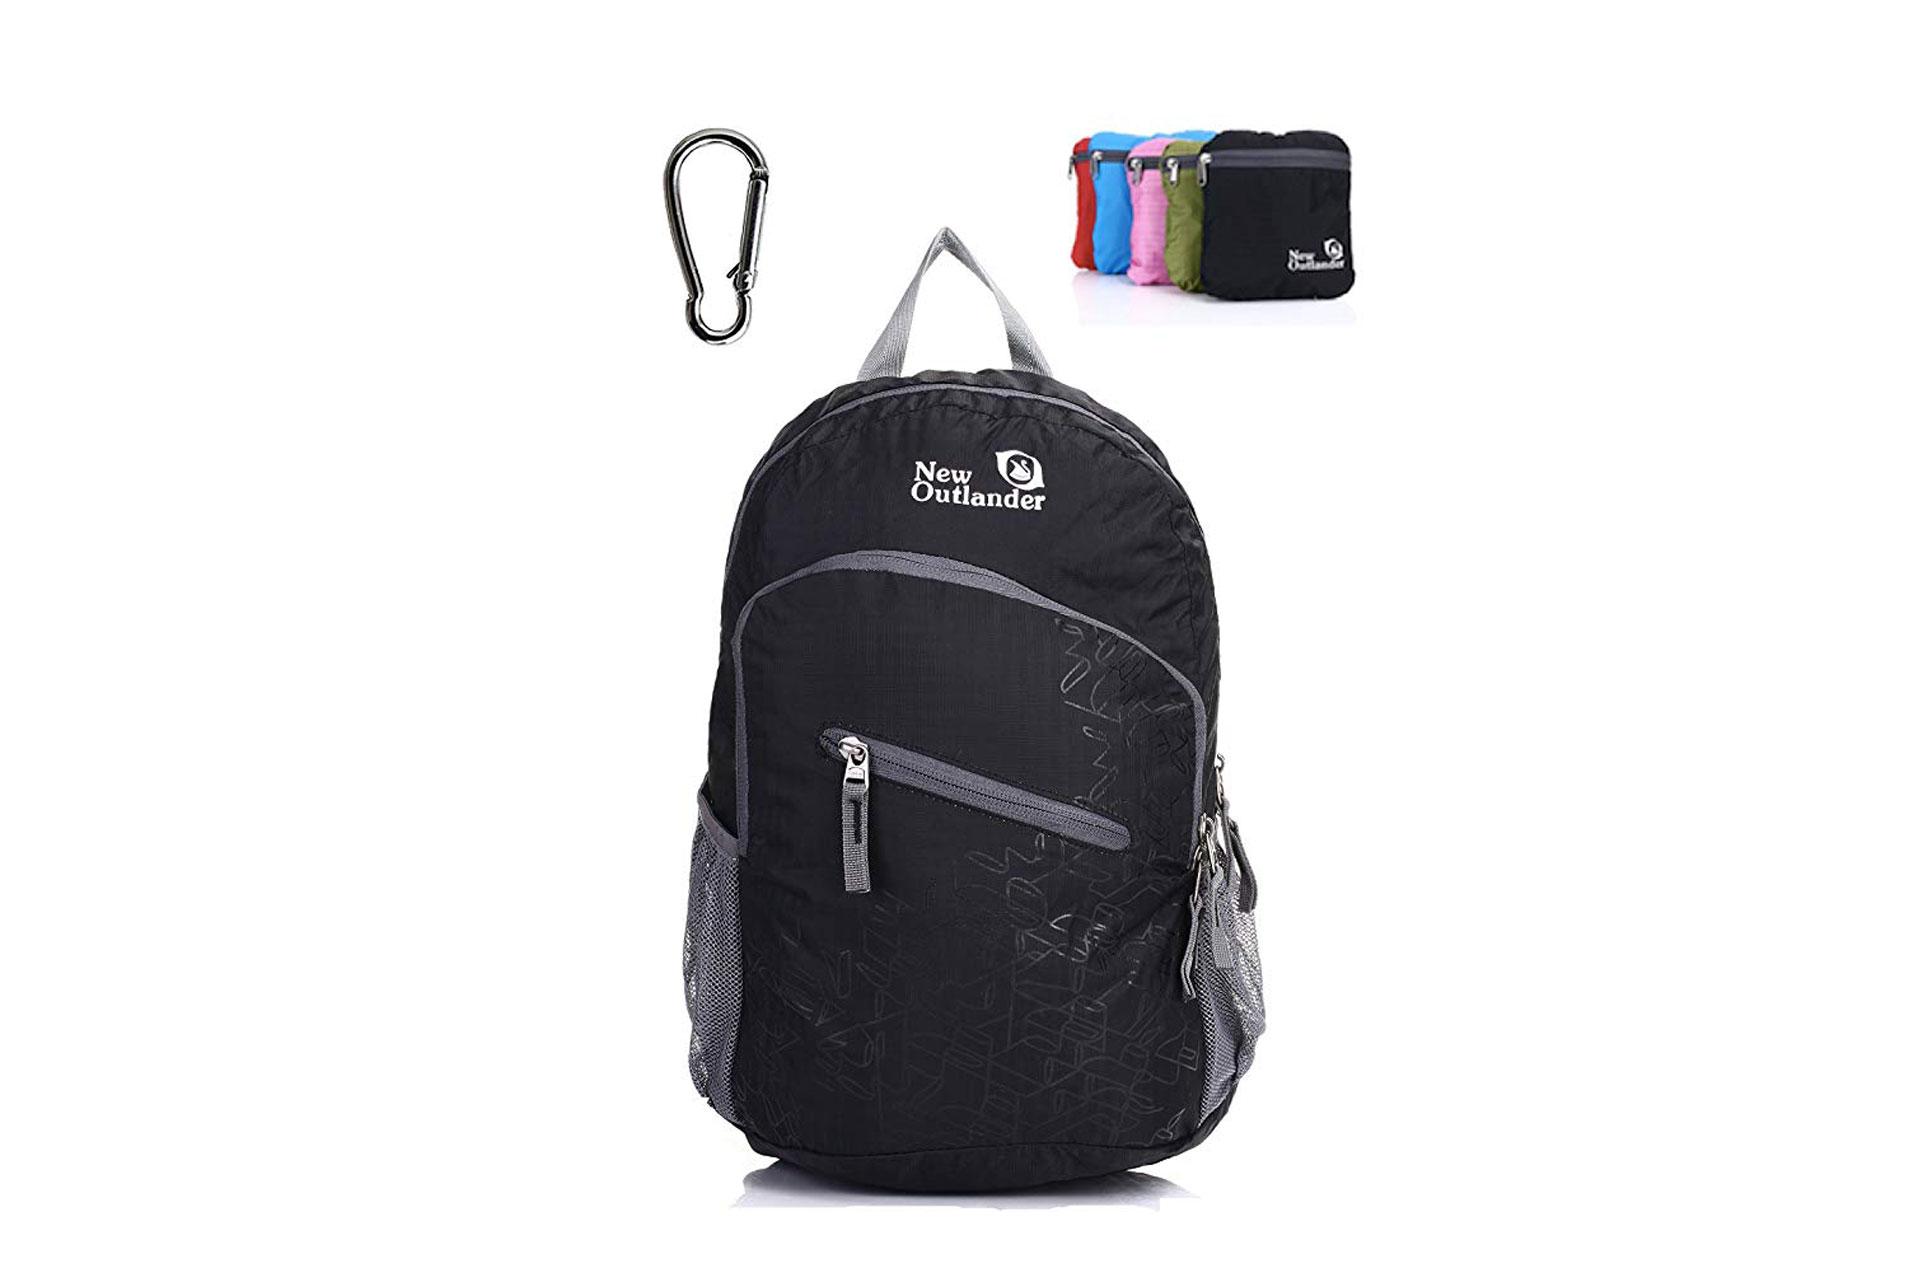 Outlander Backpack; Courtesy of Amazon